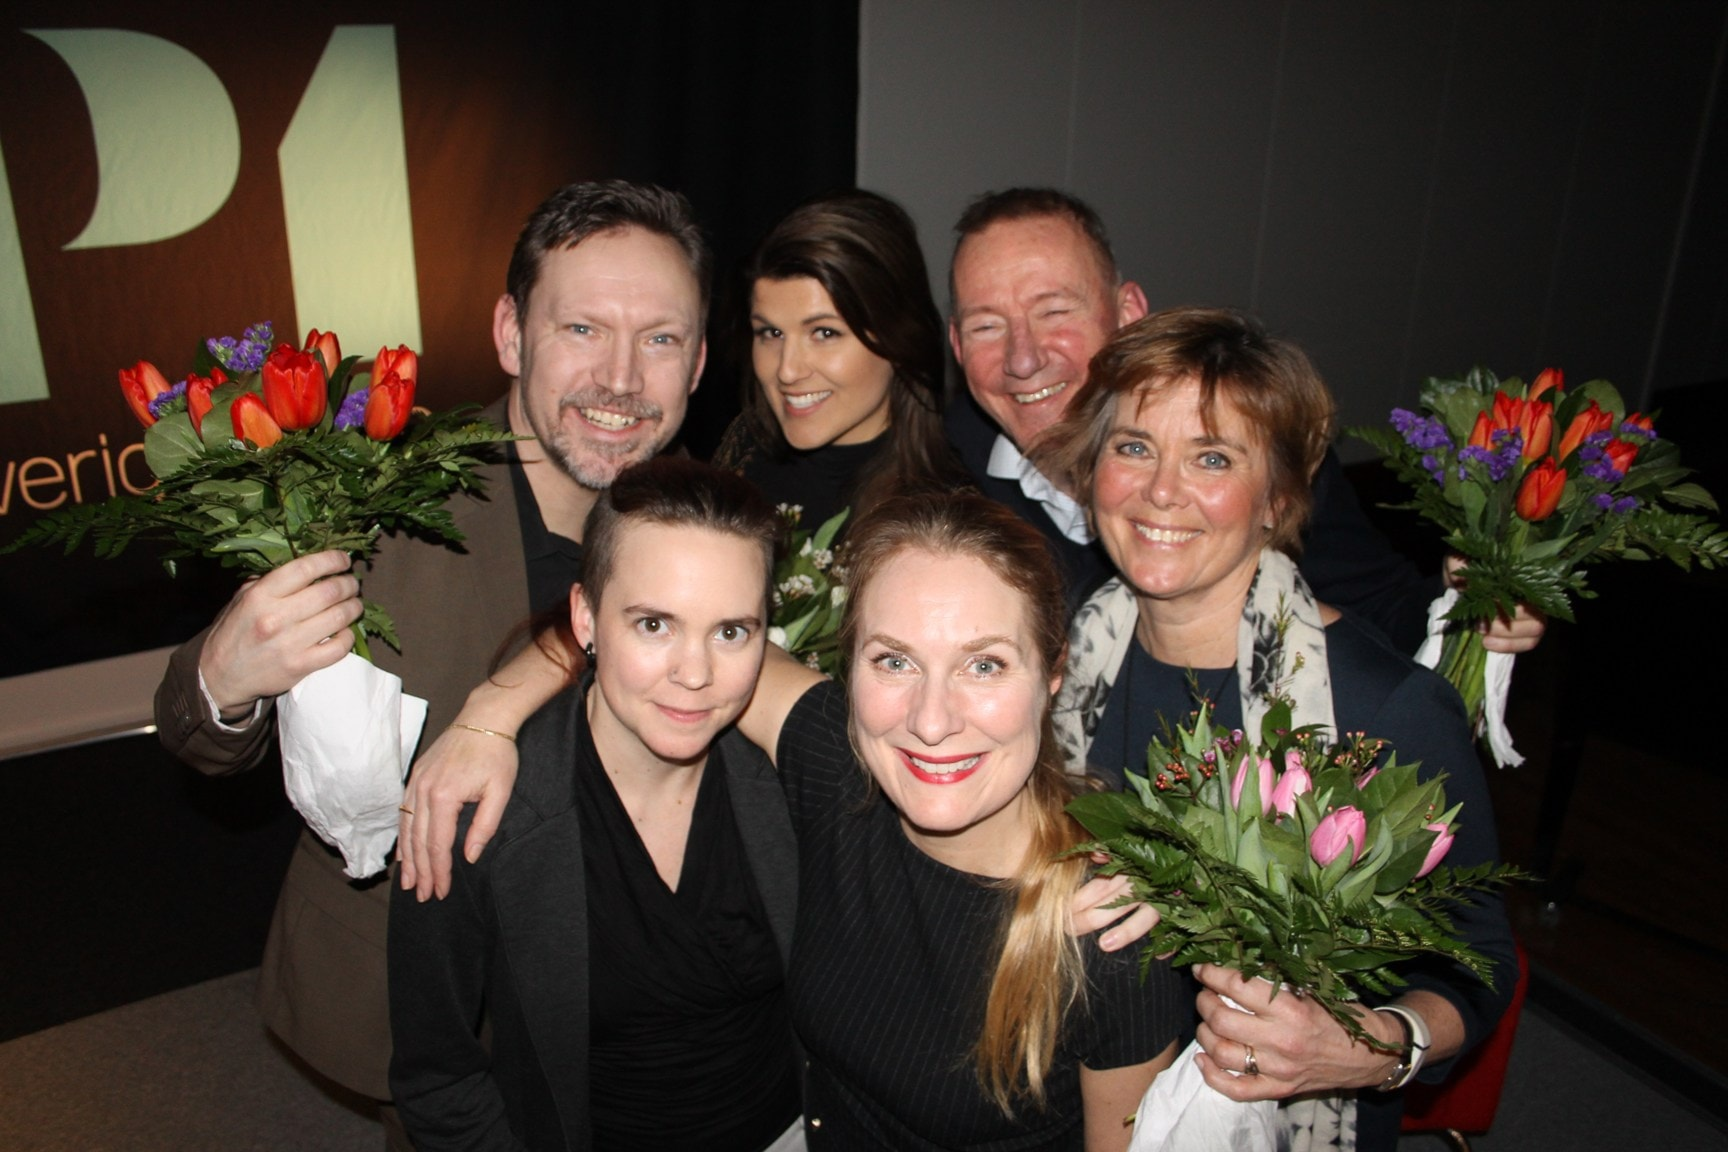 Lotta Bouvin-Sundberg, Pelle Sundberg, Erik Helmerson och Amanda Björkman!